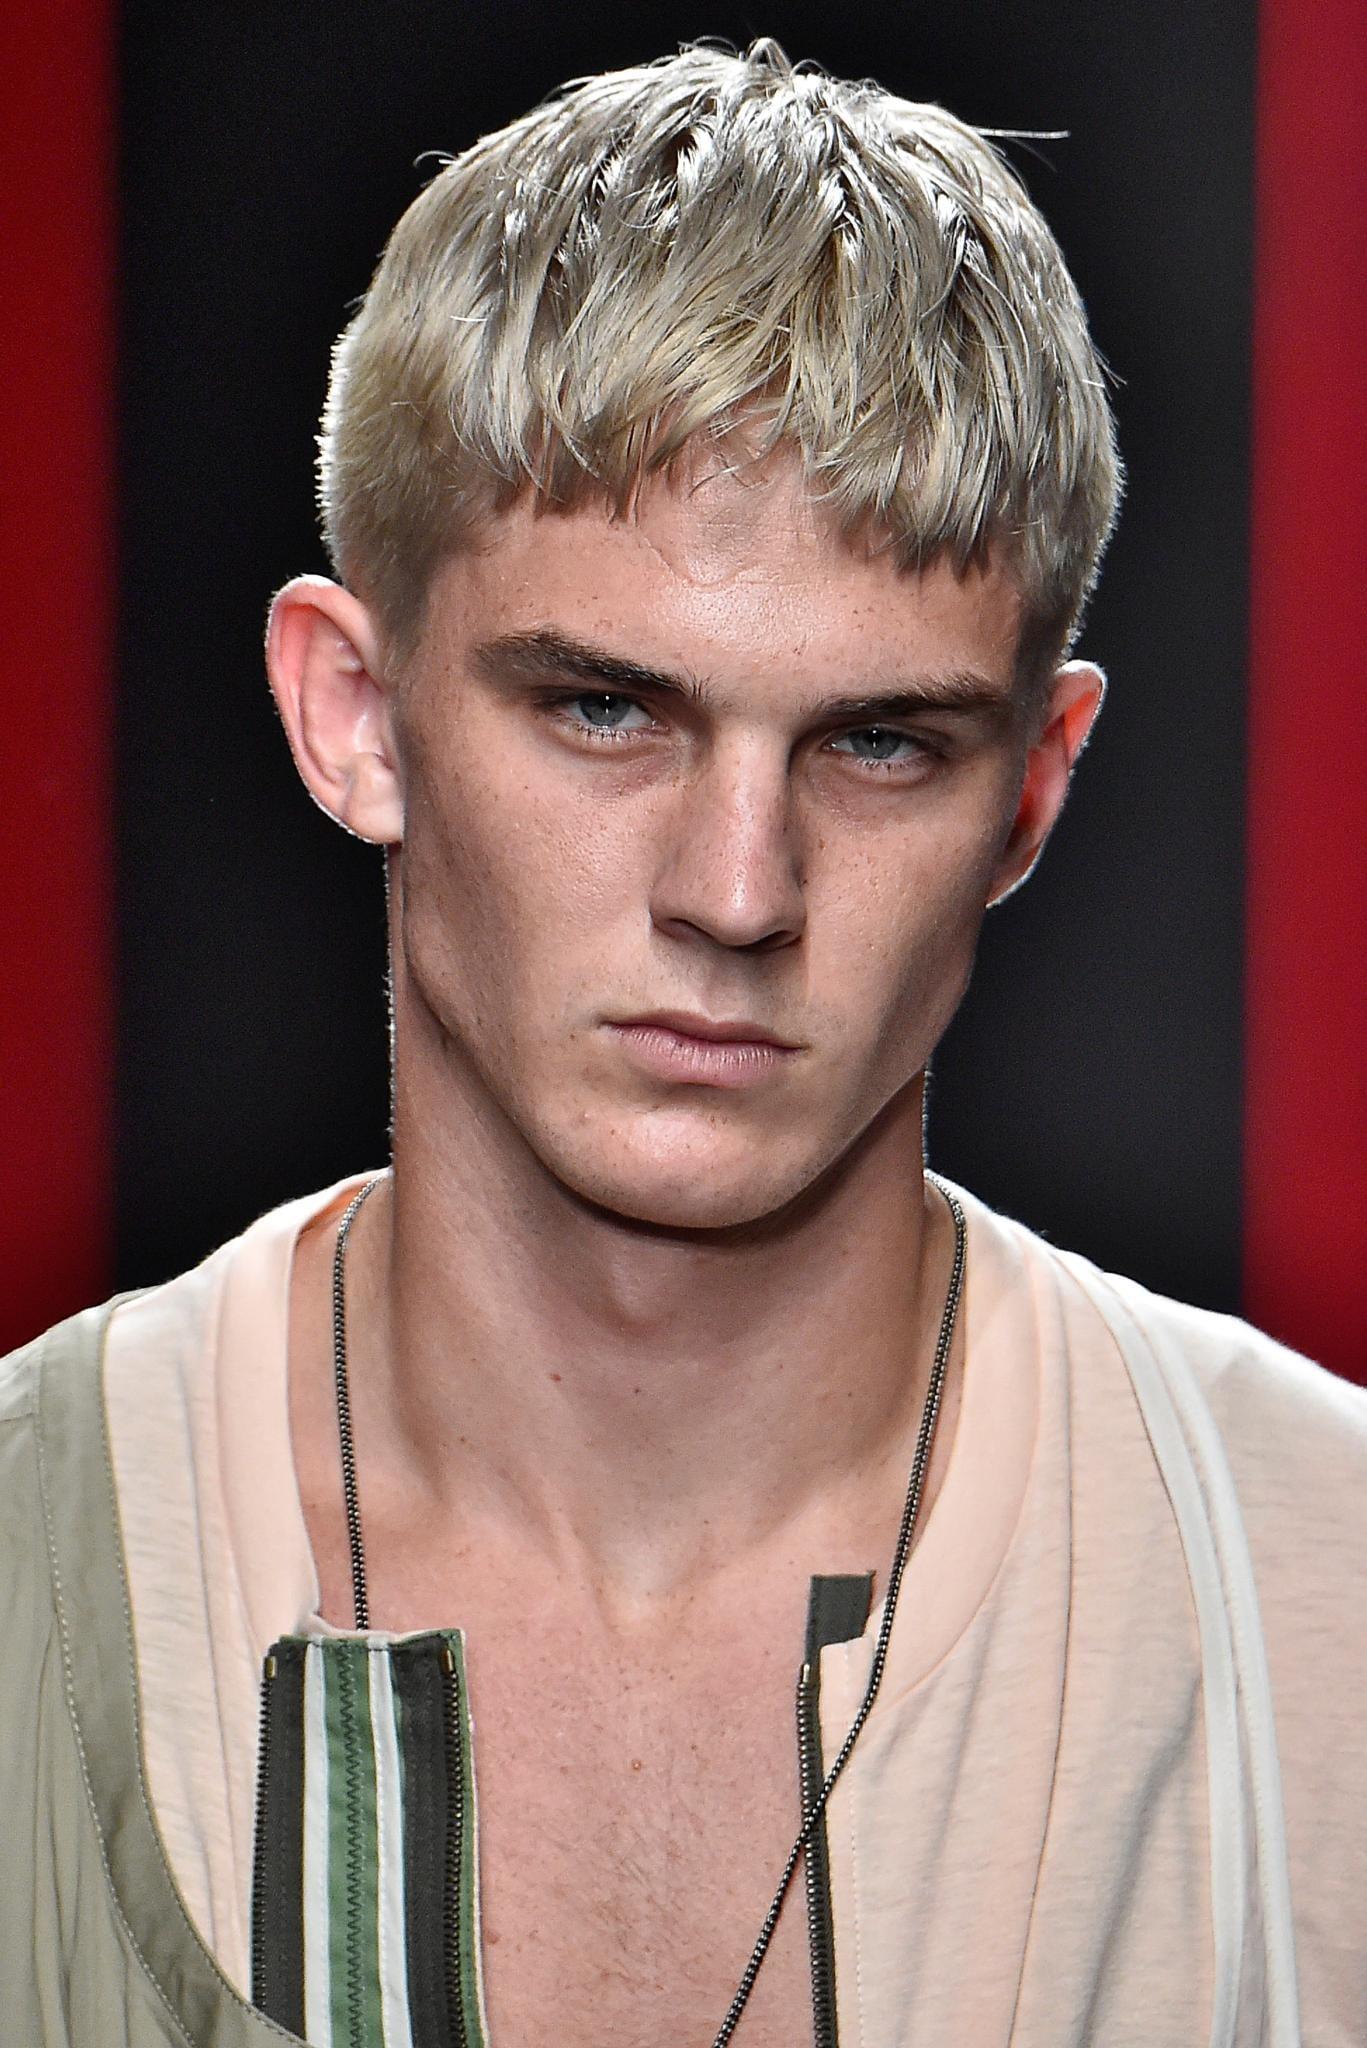 Hombre de cabello corto, rubio ceniza, peinado hacia adelante